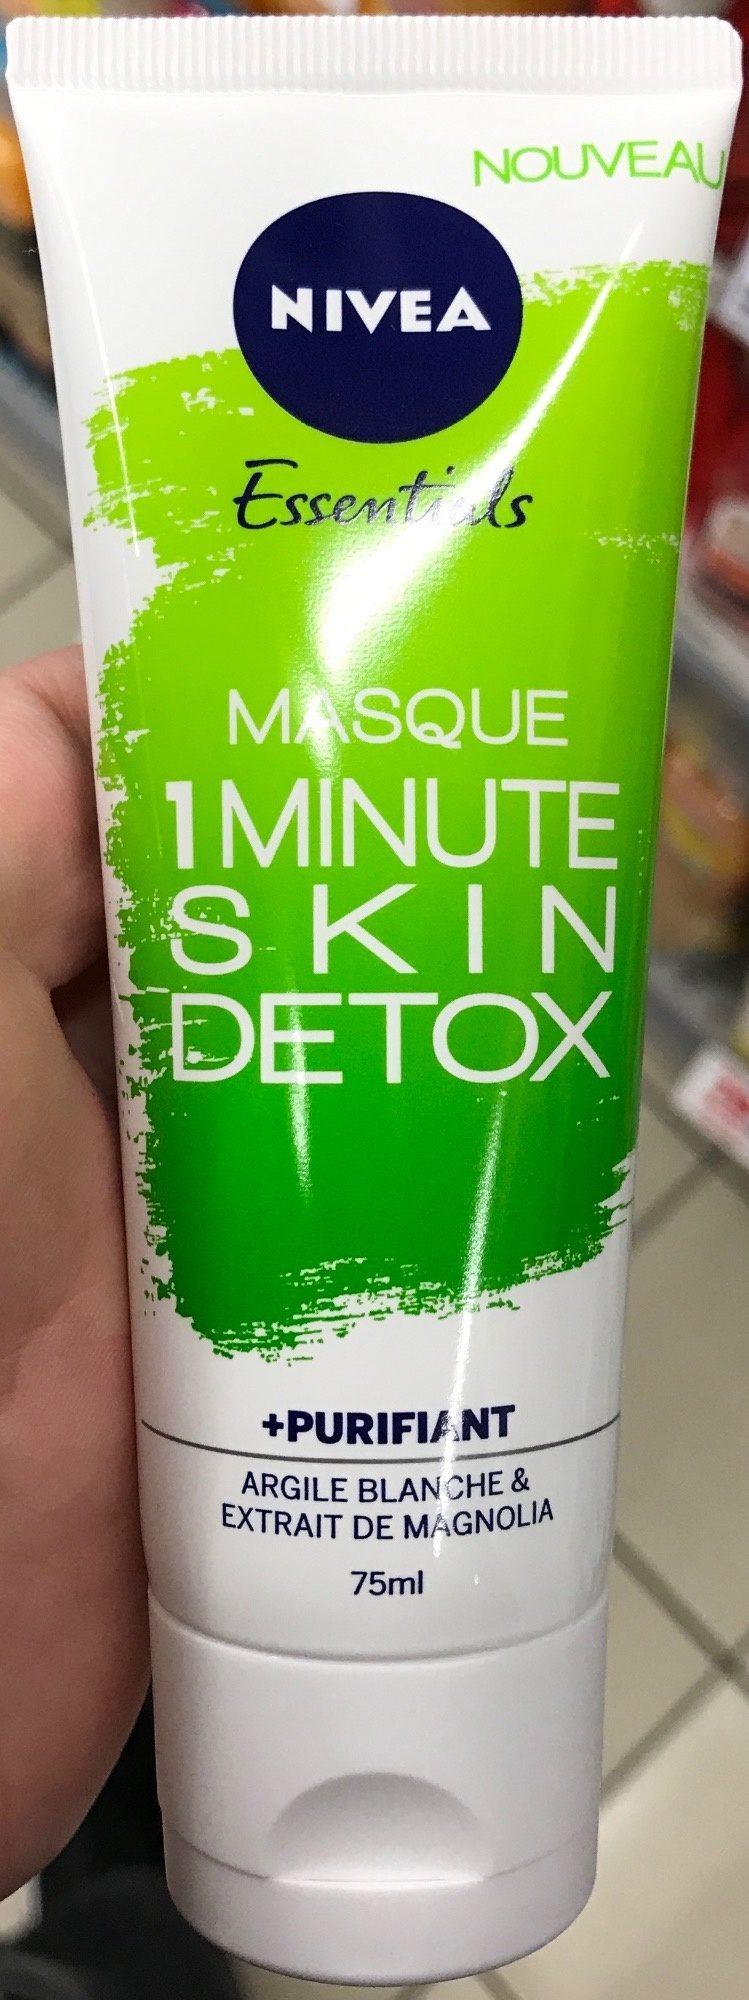 Essentials Masque 1 Minute Skin Detox + Purifiant - Product - fr